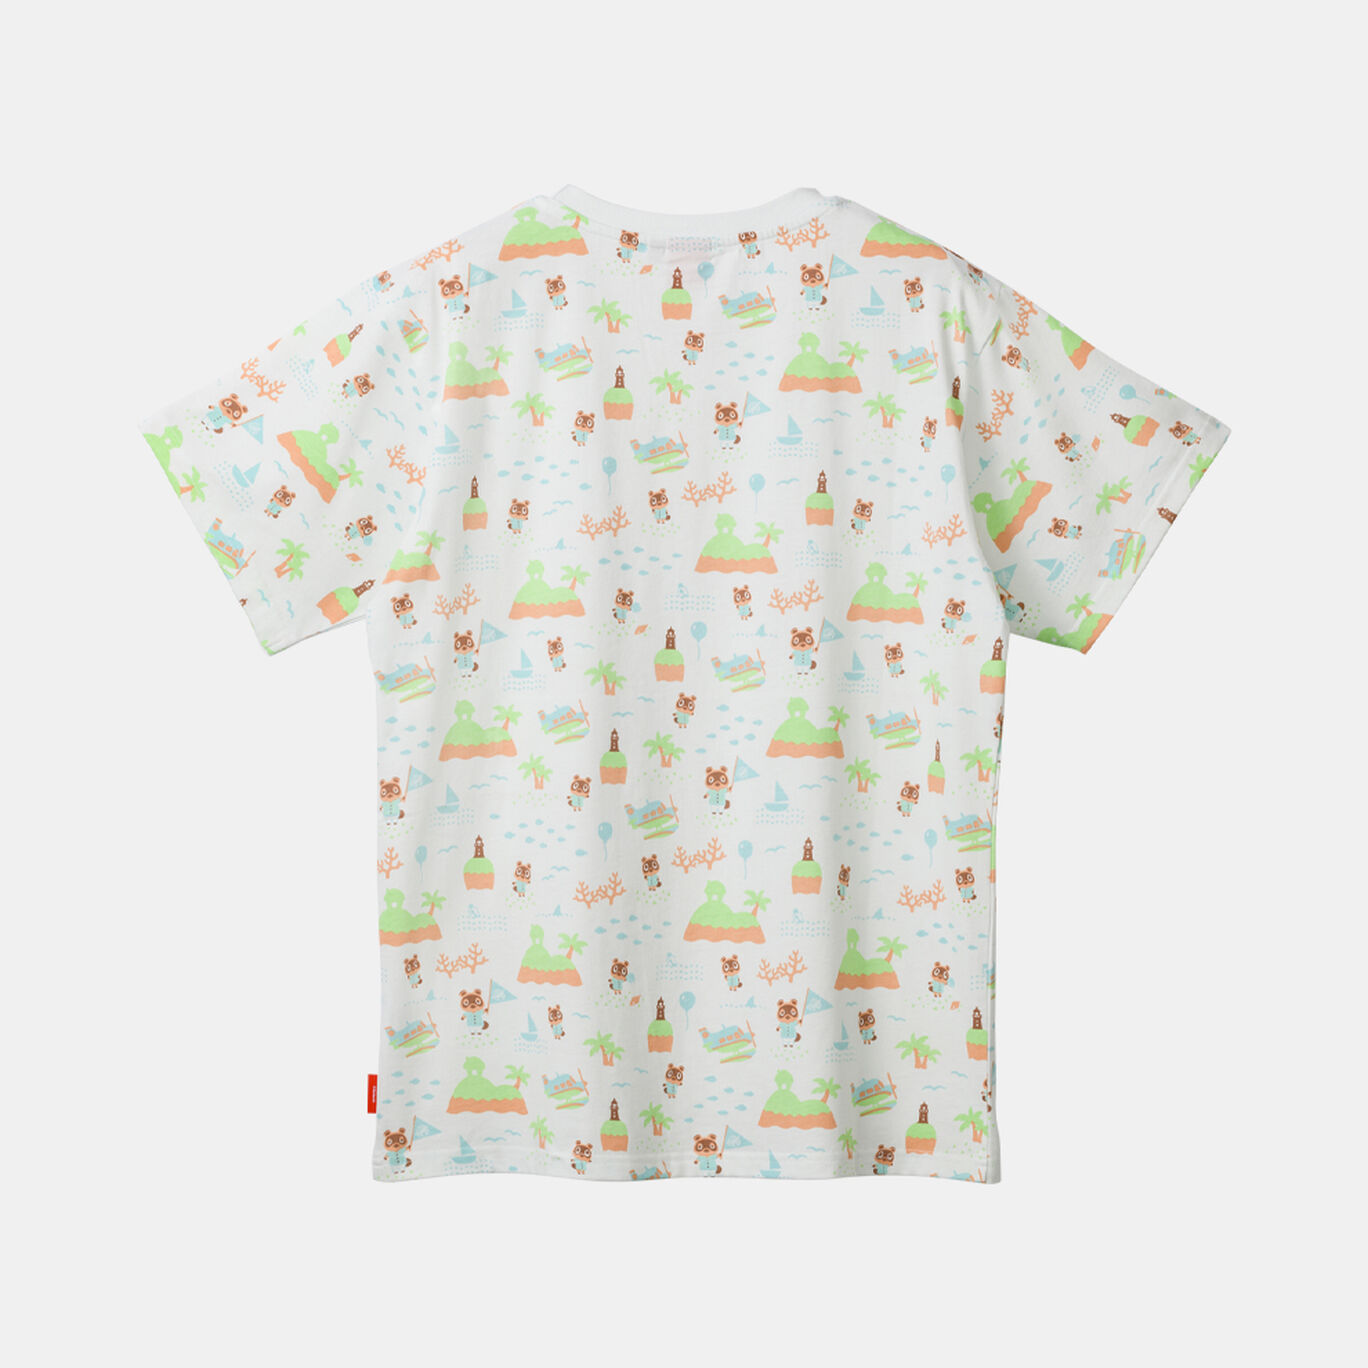 TシャツB M あつまれ どうぶつの森【Nintendo TOKYO取り扱い商品】